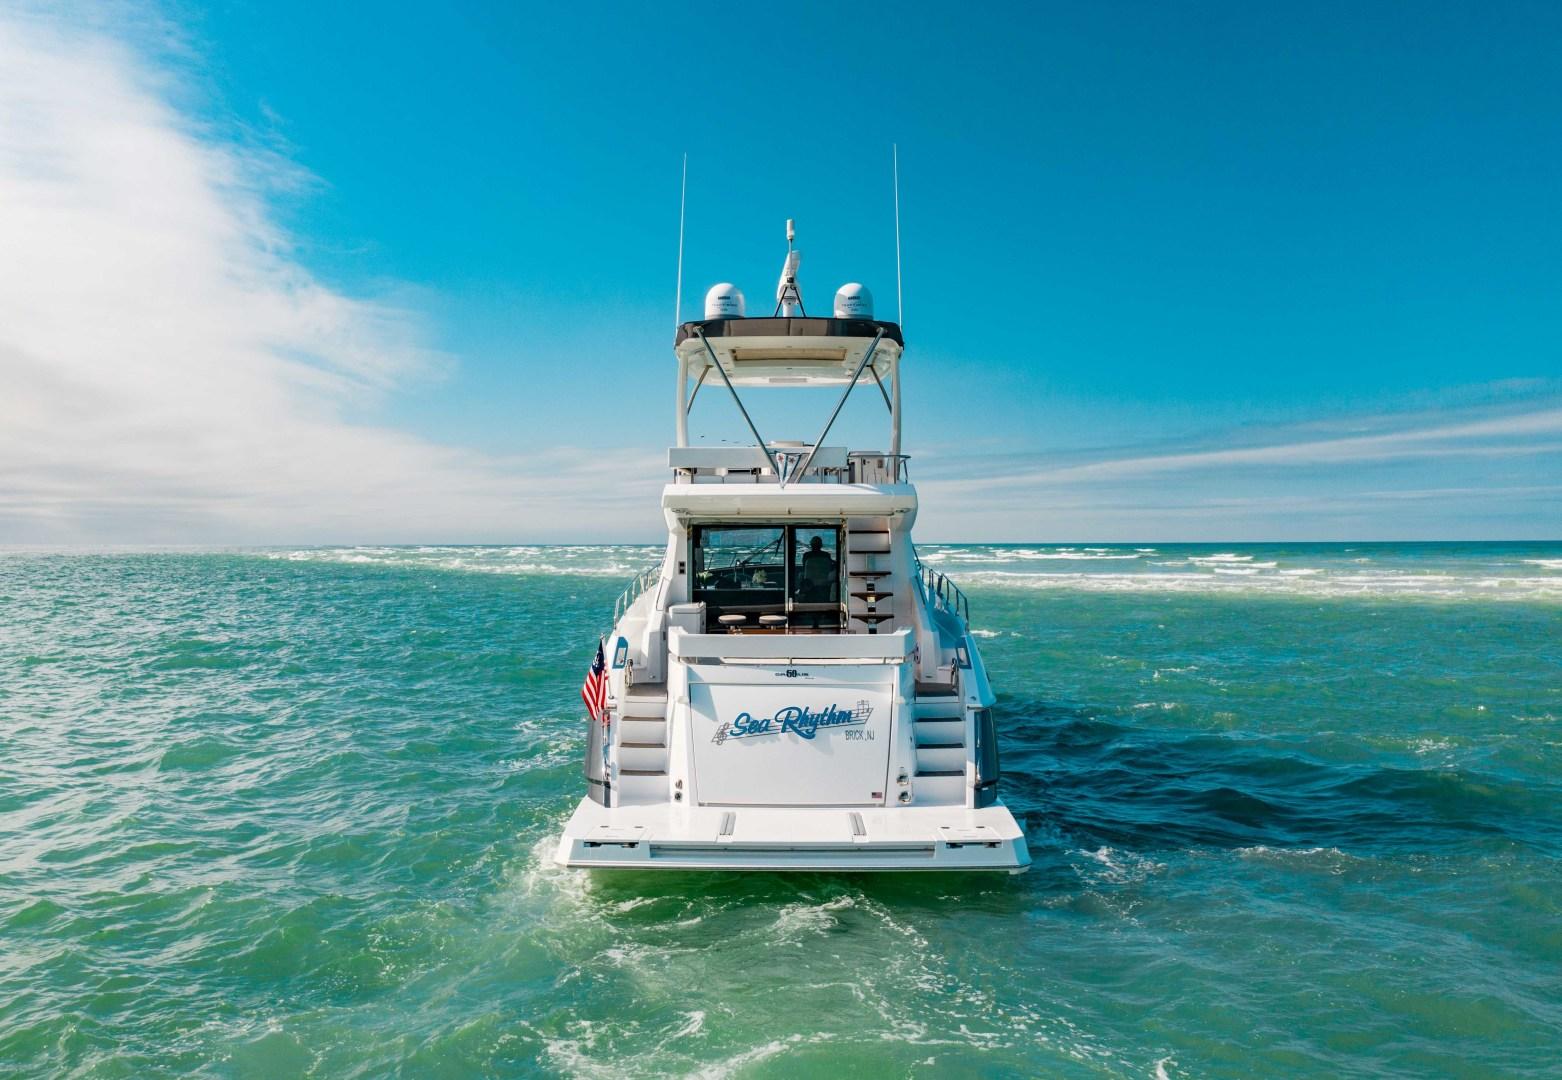 Cruisers-60 Cantius 2018-Sea Rhythm III Anna Maria-Florida-United States-2018 Cruisers 60 Cantius FB  Sea Rhythm III  Stern Profile-1583324 | Thumbnail